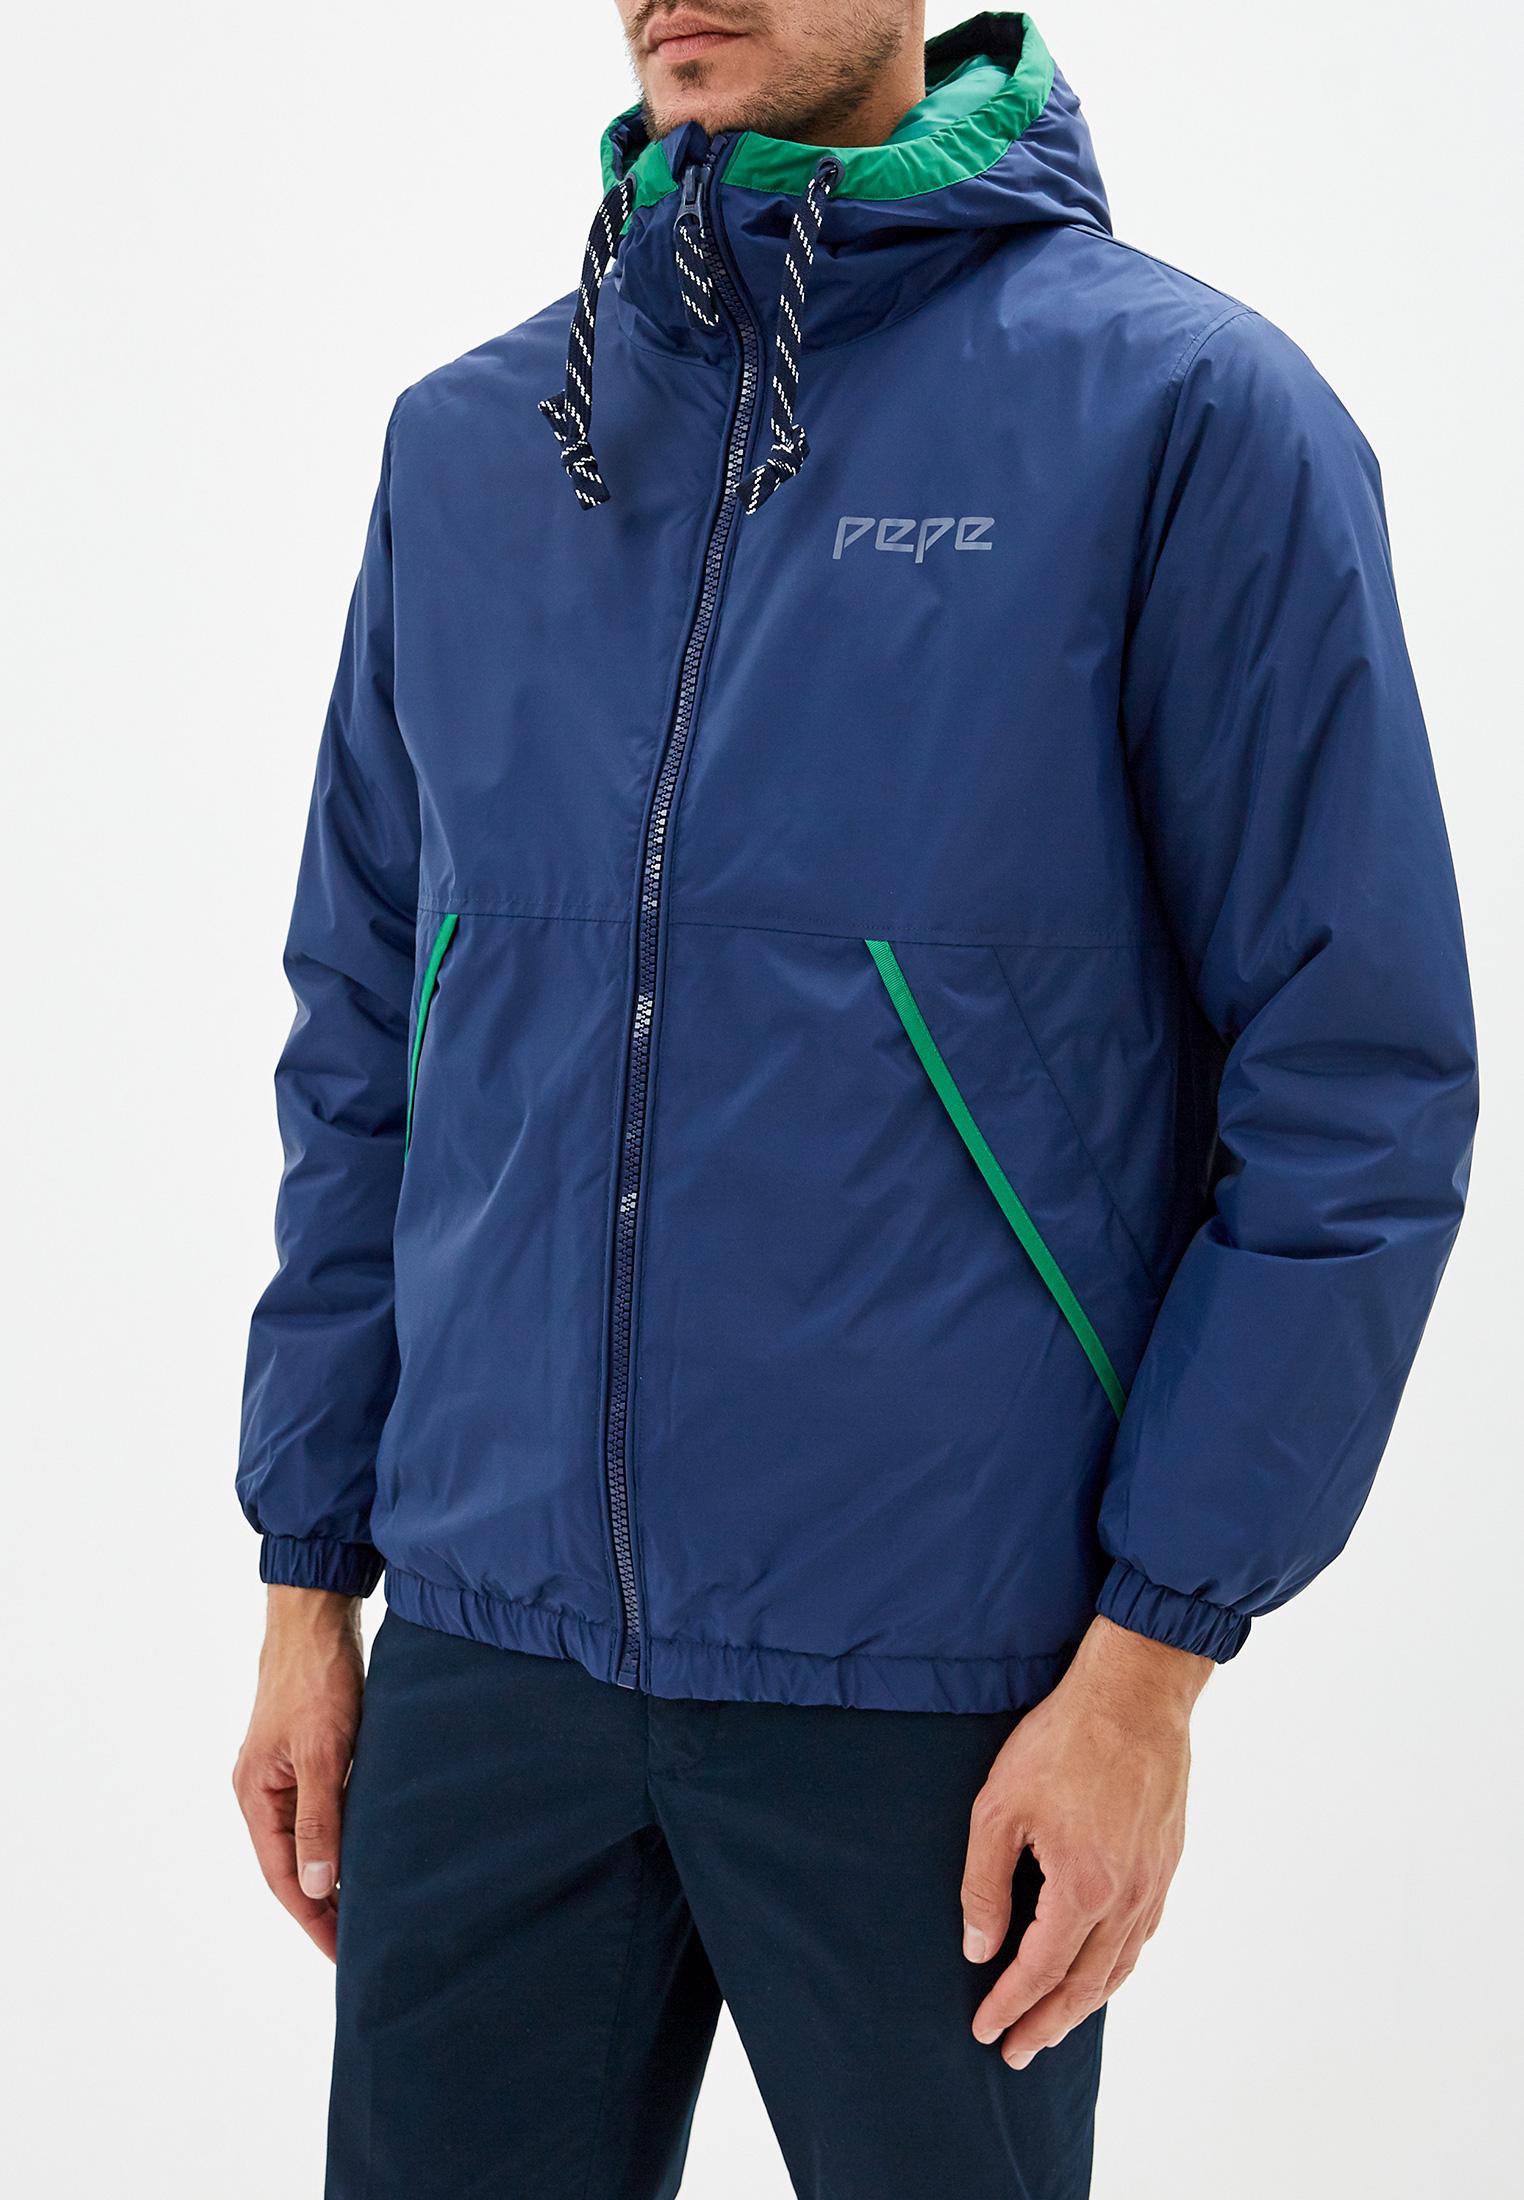 Утепленная куртка Pepe Jeans (Пепе Джинс) PM402098